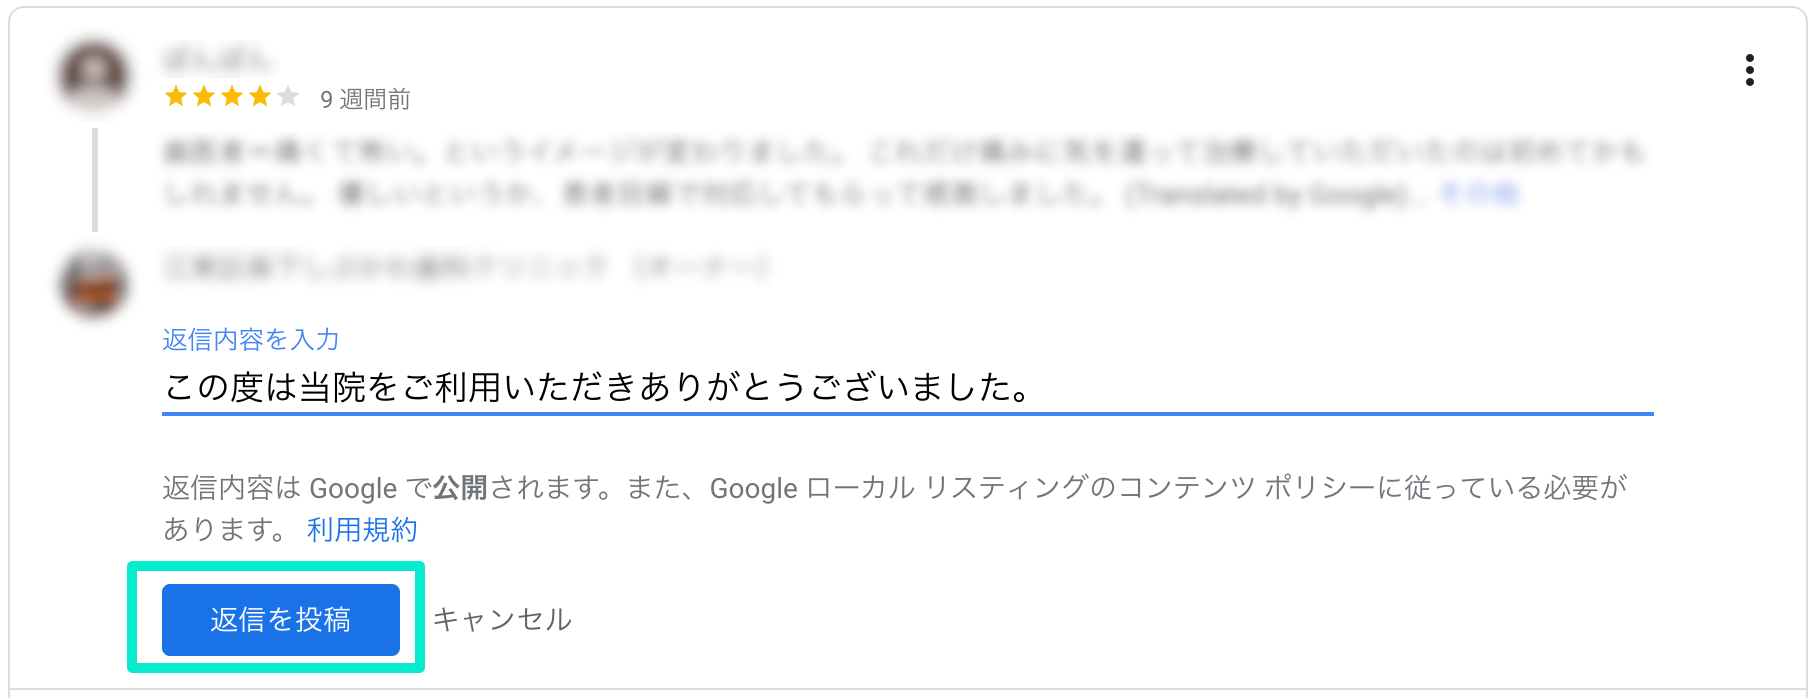 Googleマイビジネス クチコミ返信メッセージ